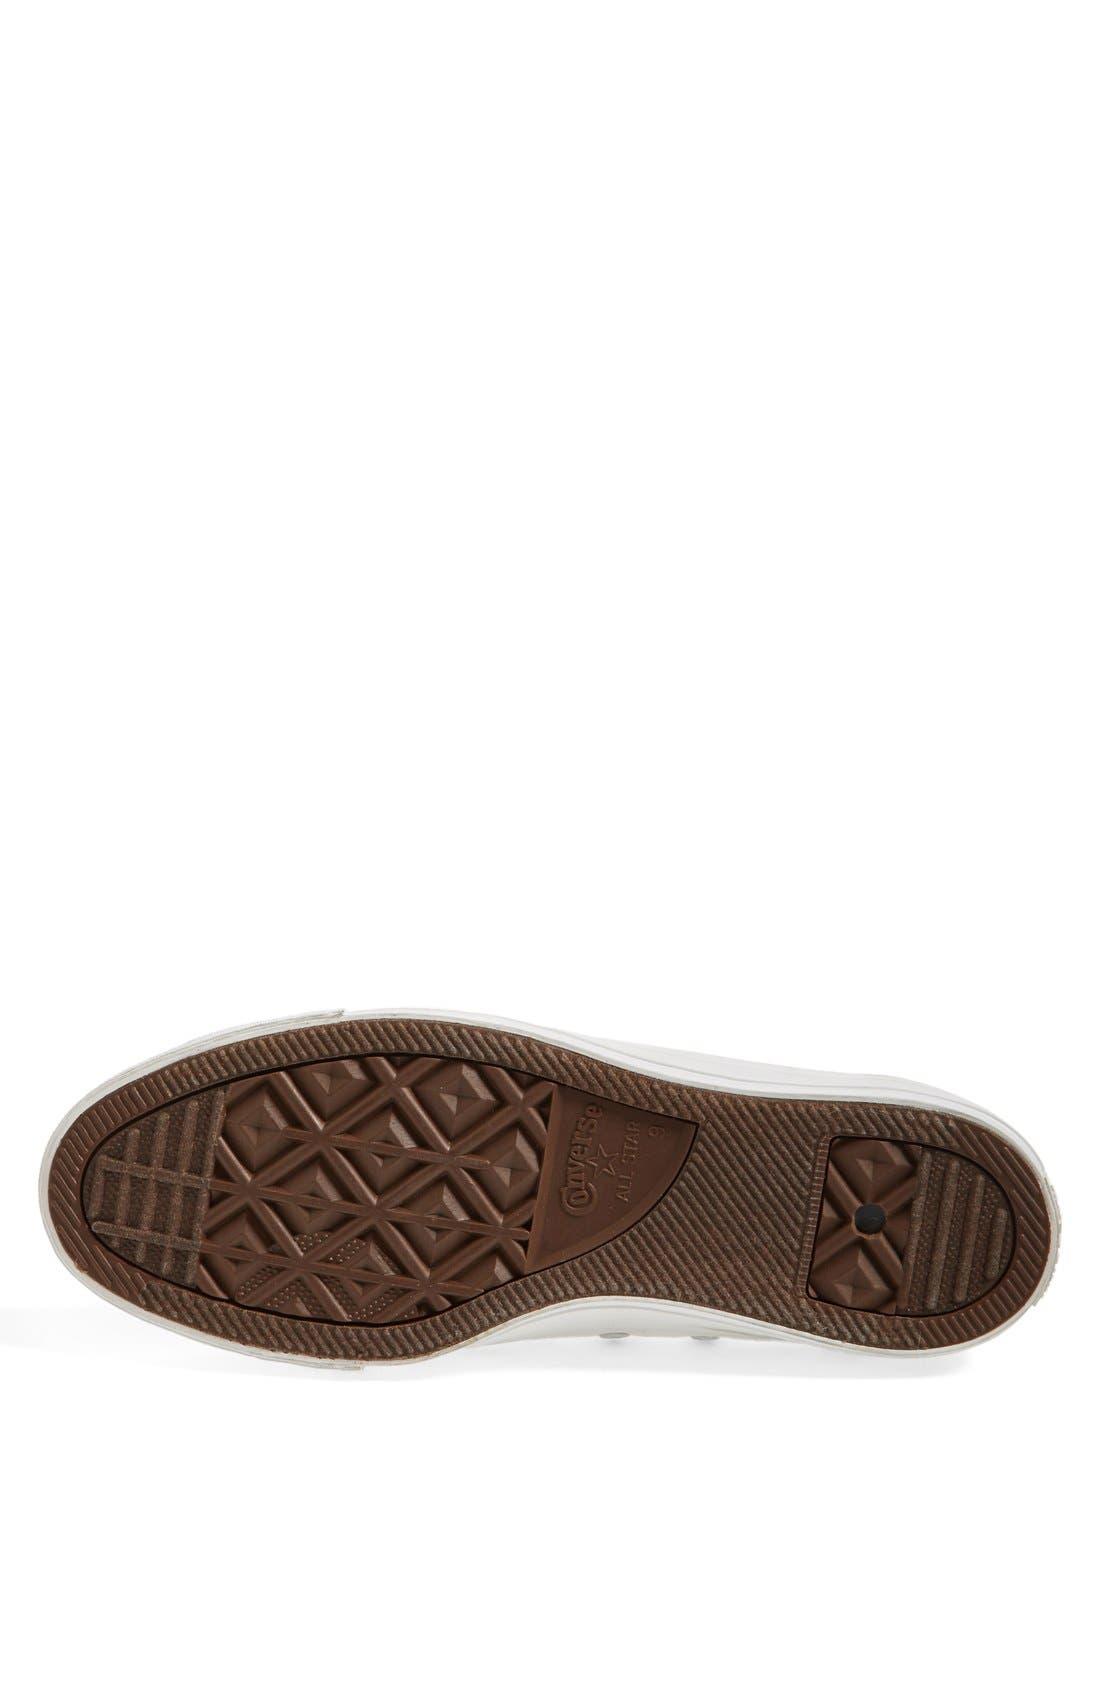 Alternate Image 4  - Converse Chuck Taylor® All Star® Slip-On Sneaker (Men)